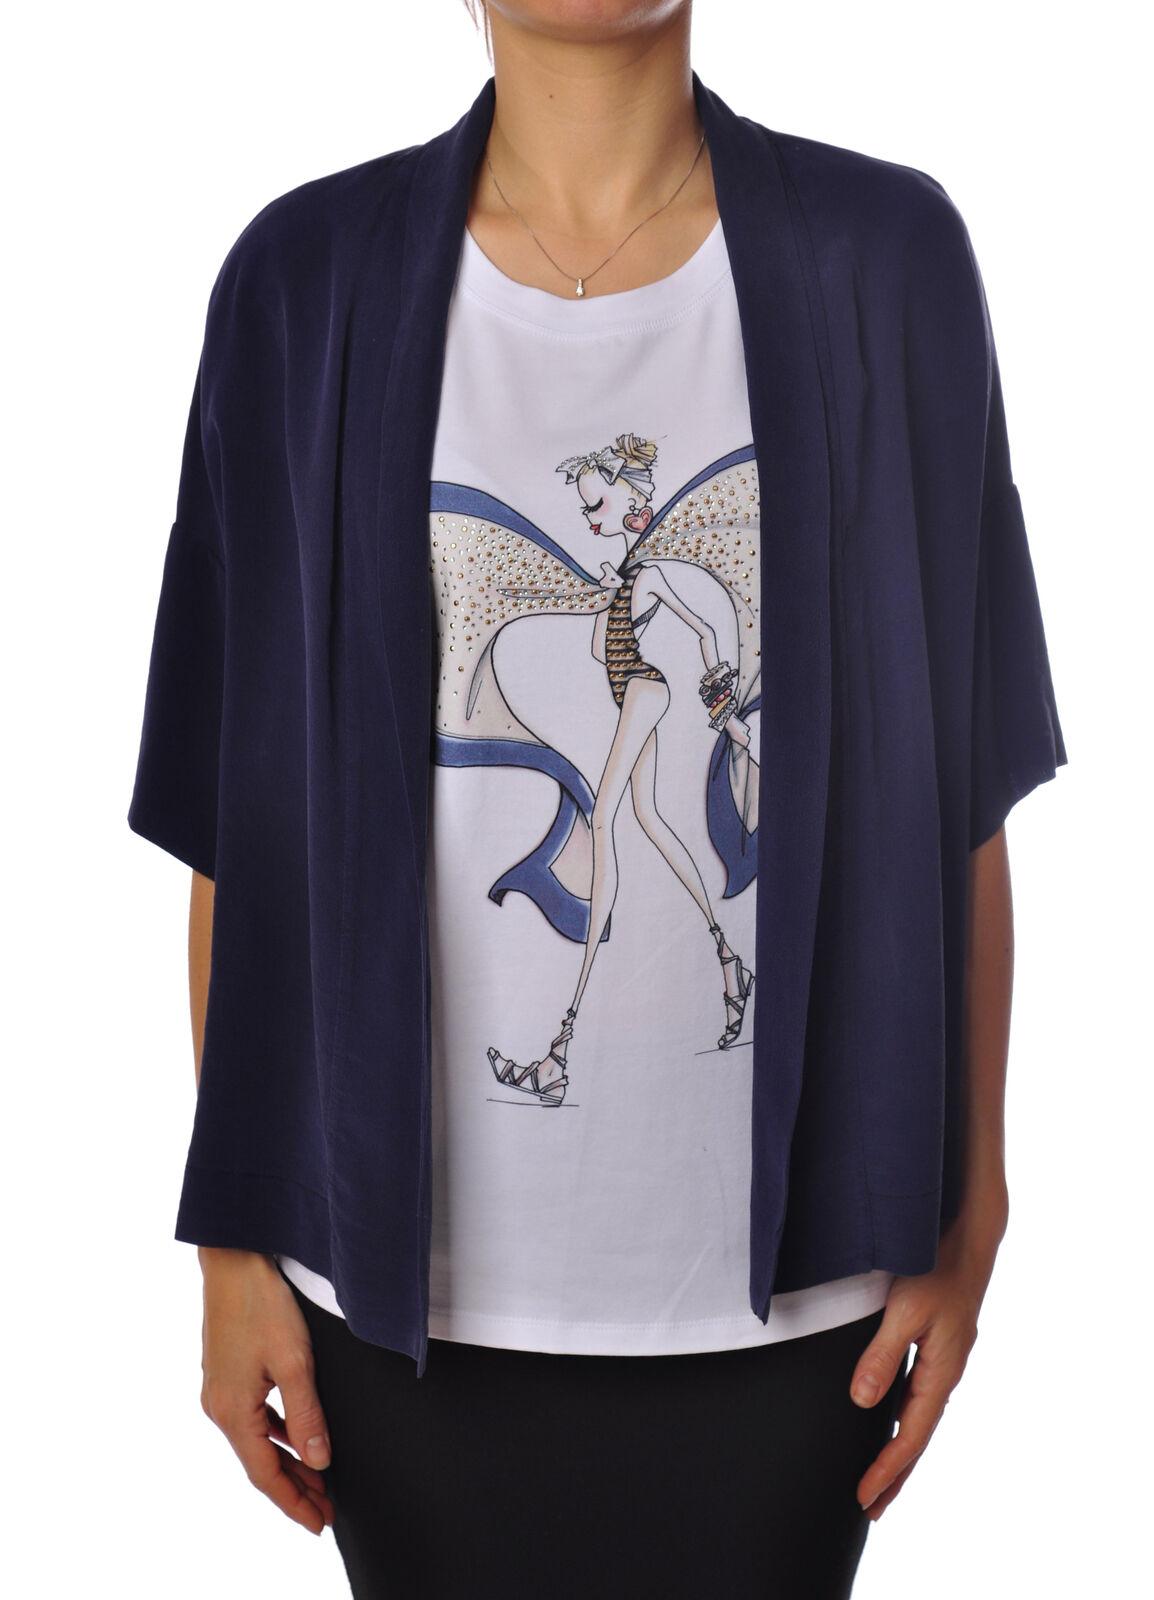 Ottod'ame  -  Blouses - Female - bluee - 2095008A184255